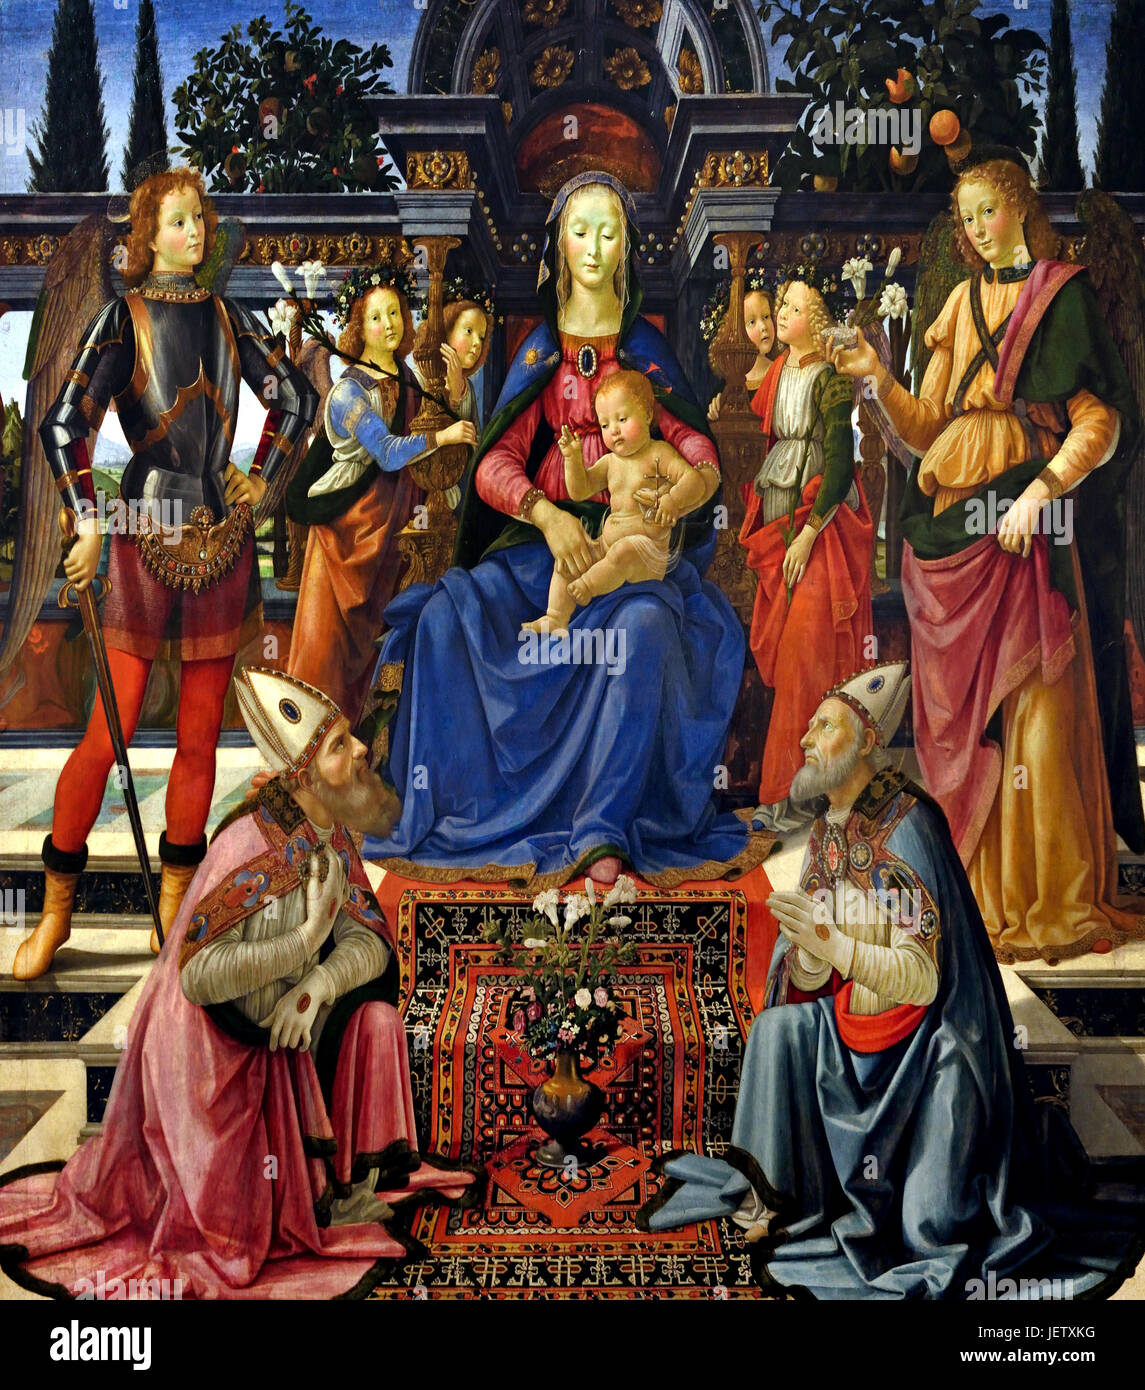 The Madonna and Child adored by St Zenobius and St Justus, 1483 Domenico Ghirlandaio Italian 1448 –1494 Italian - Stock Image